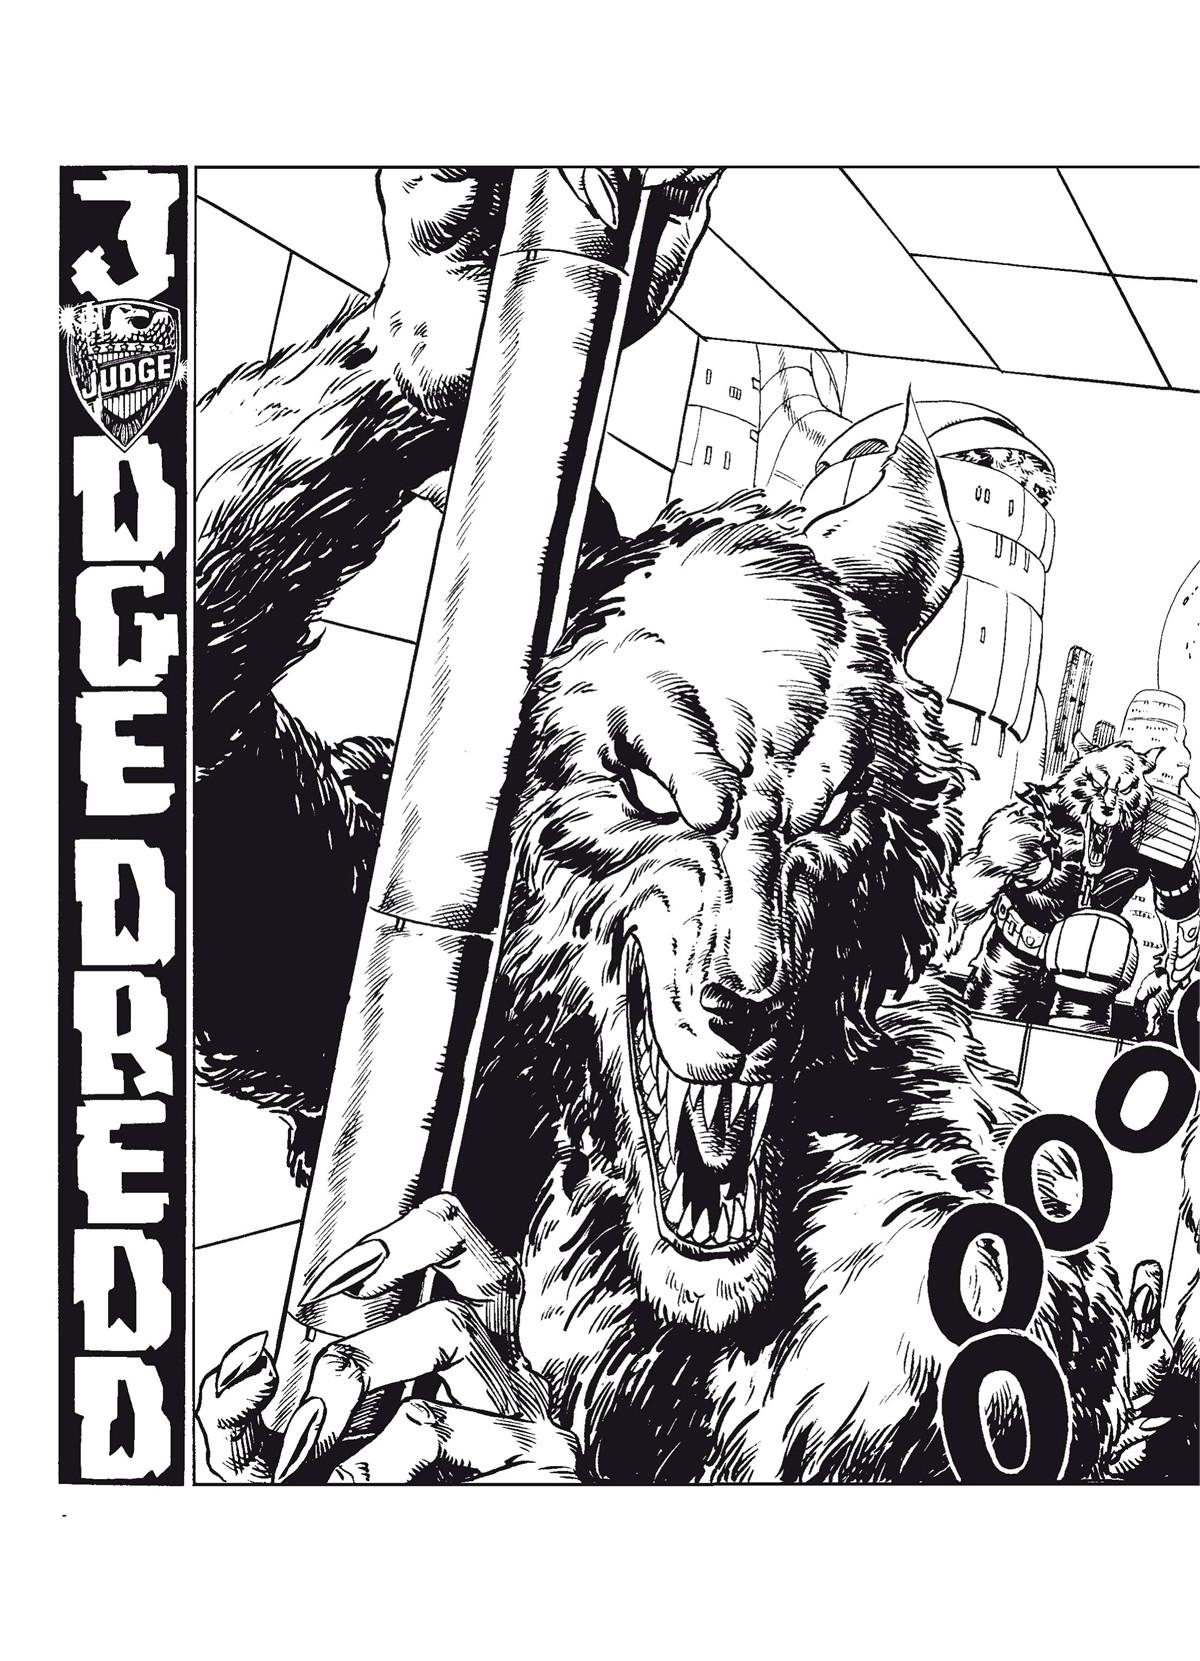 Judge dredd cry of the werewolf 9781781080320.in01